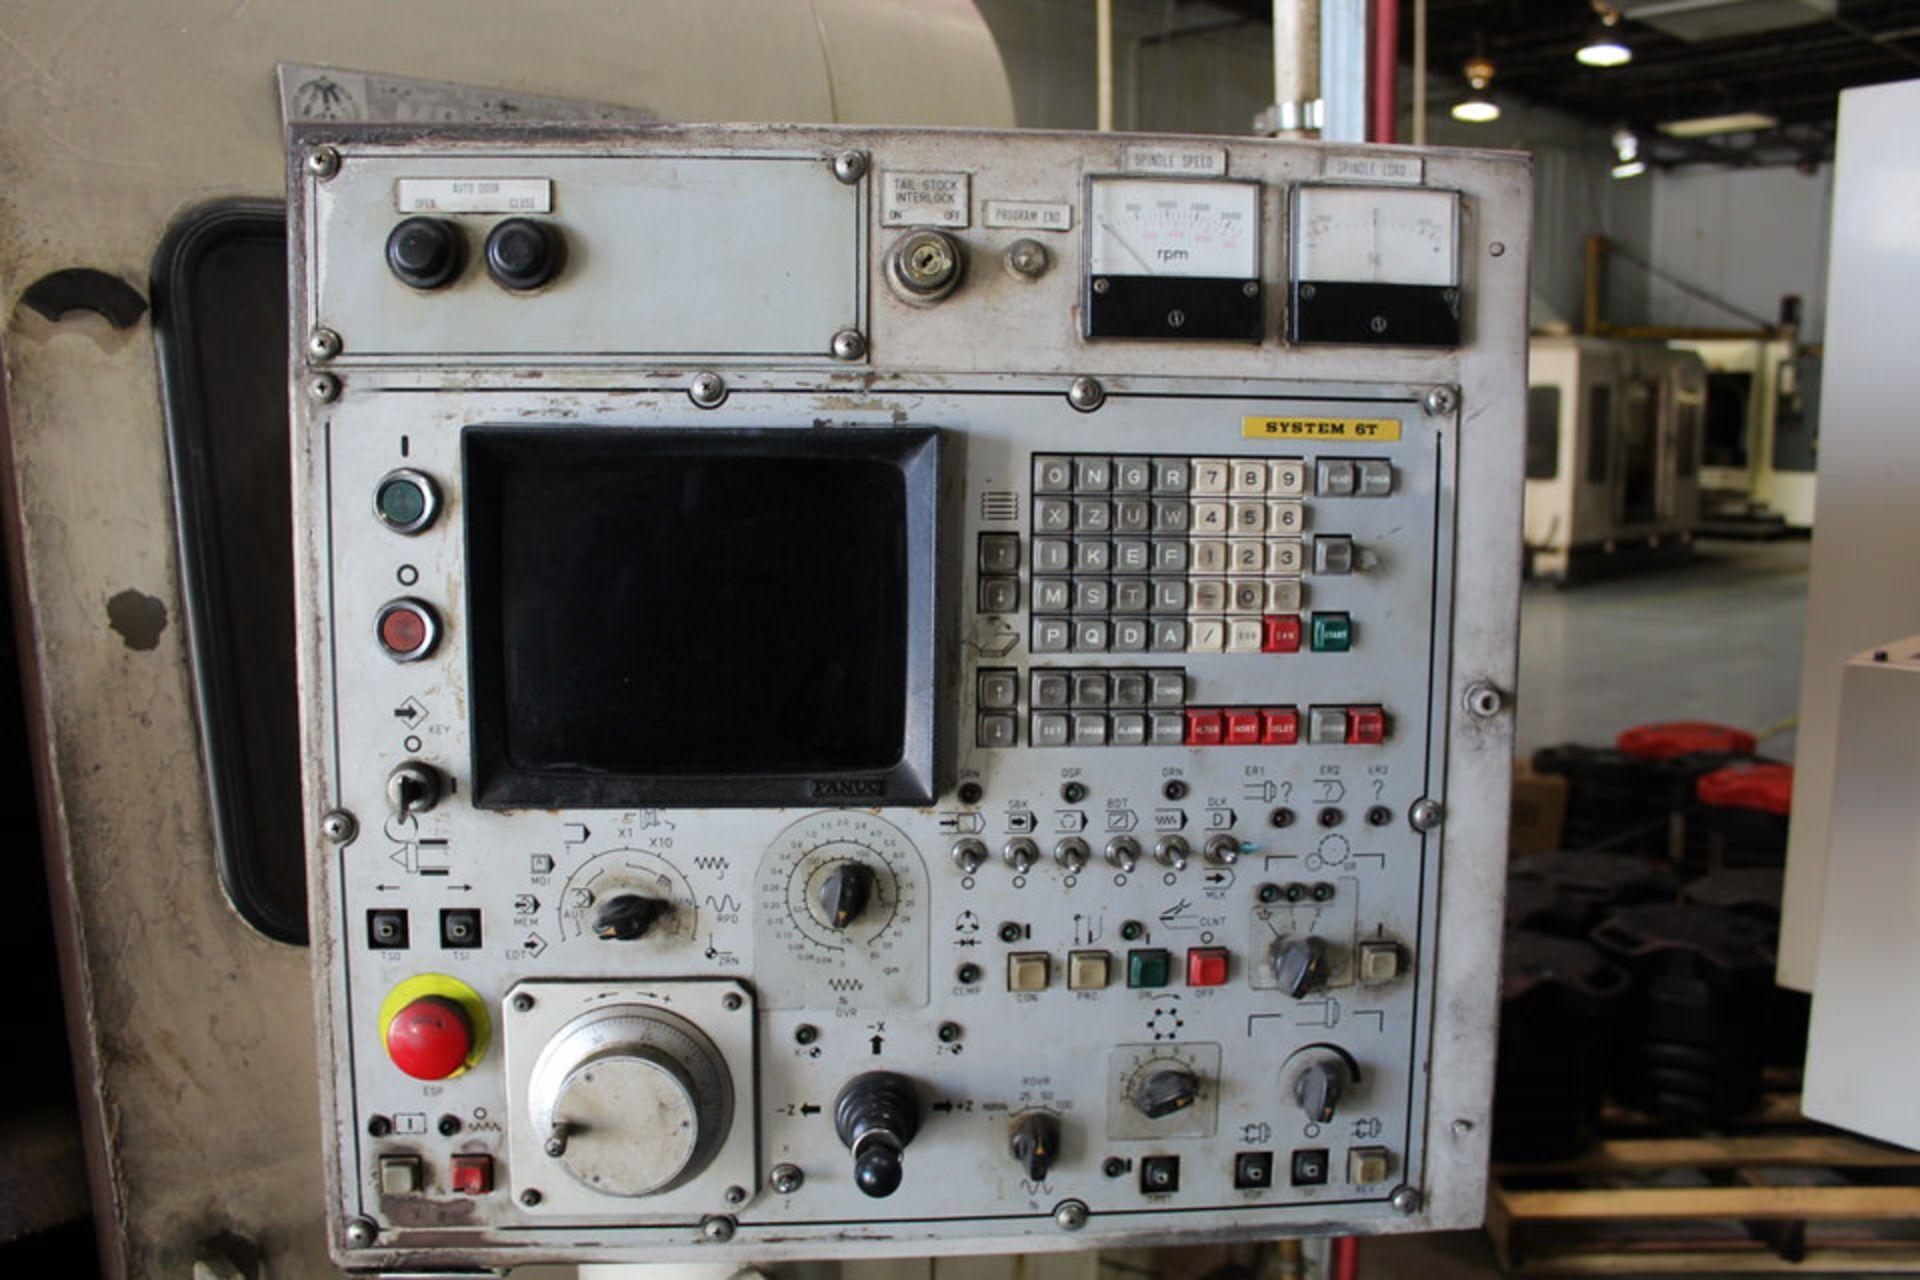 Lot 24 - MORI SEIKI SL-4 CNC LATHE W/ FANUC SYSTEM 6-T CONTROL